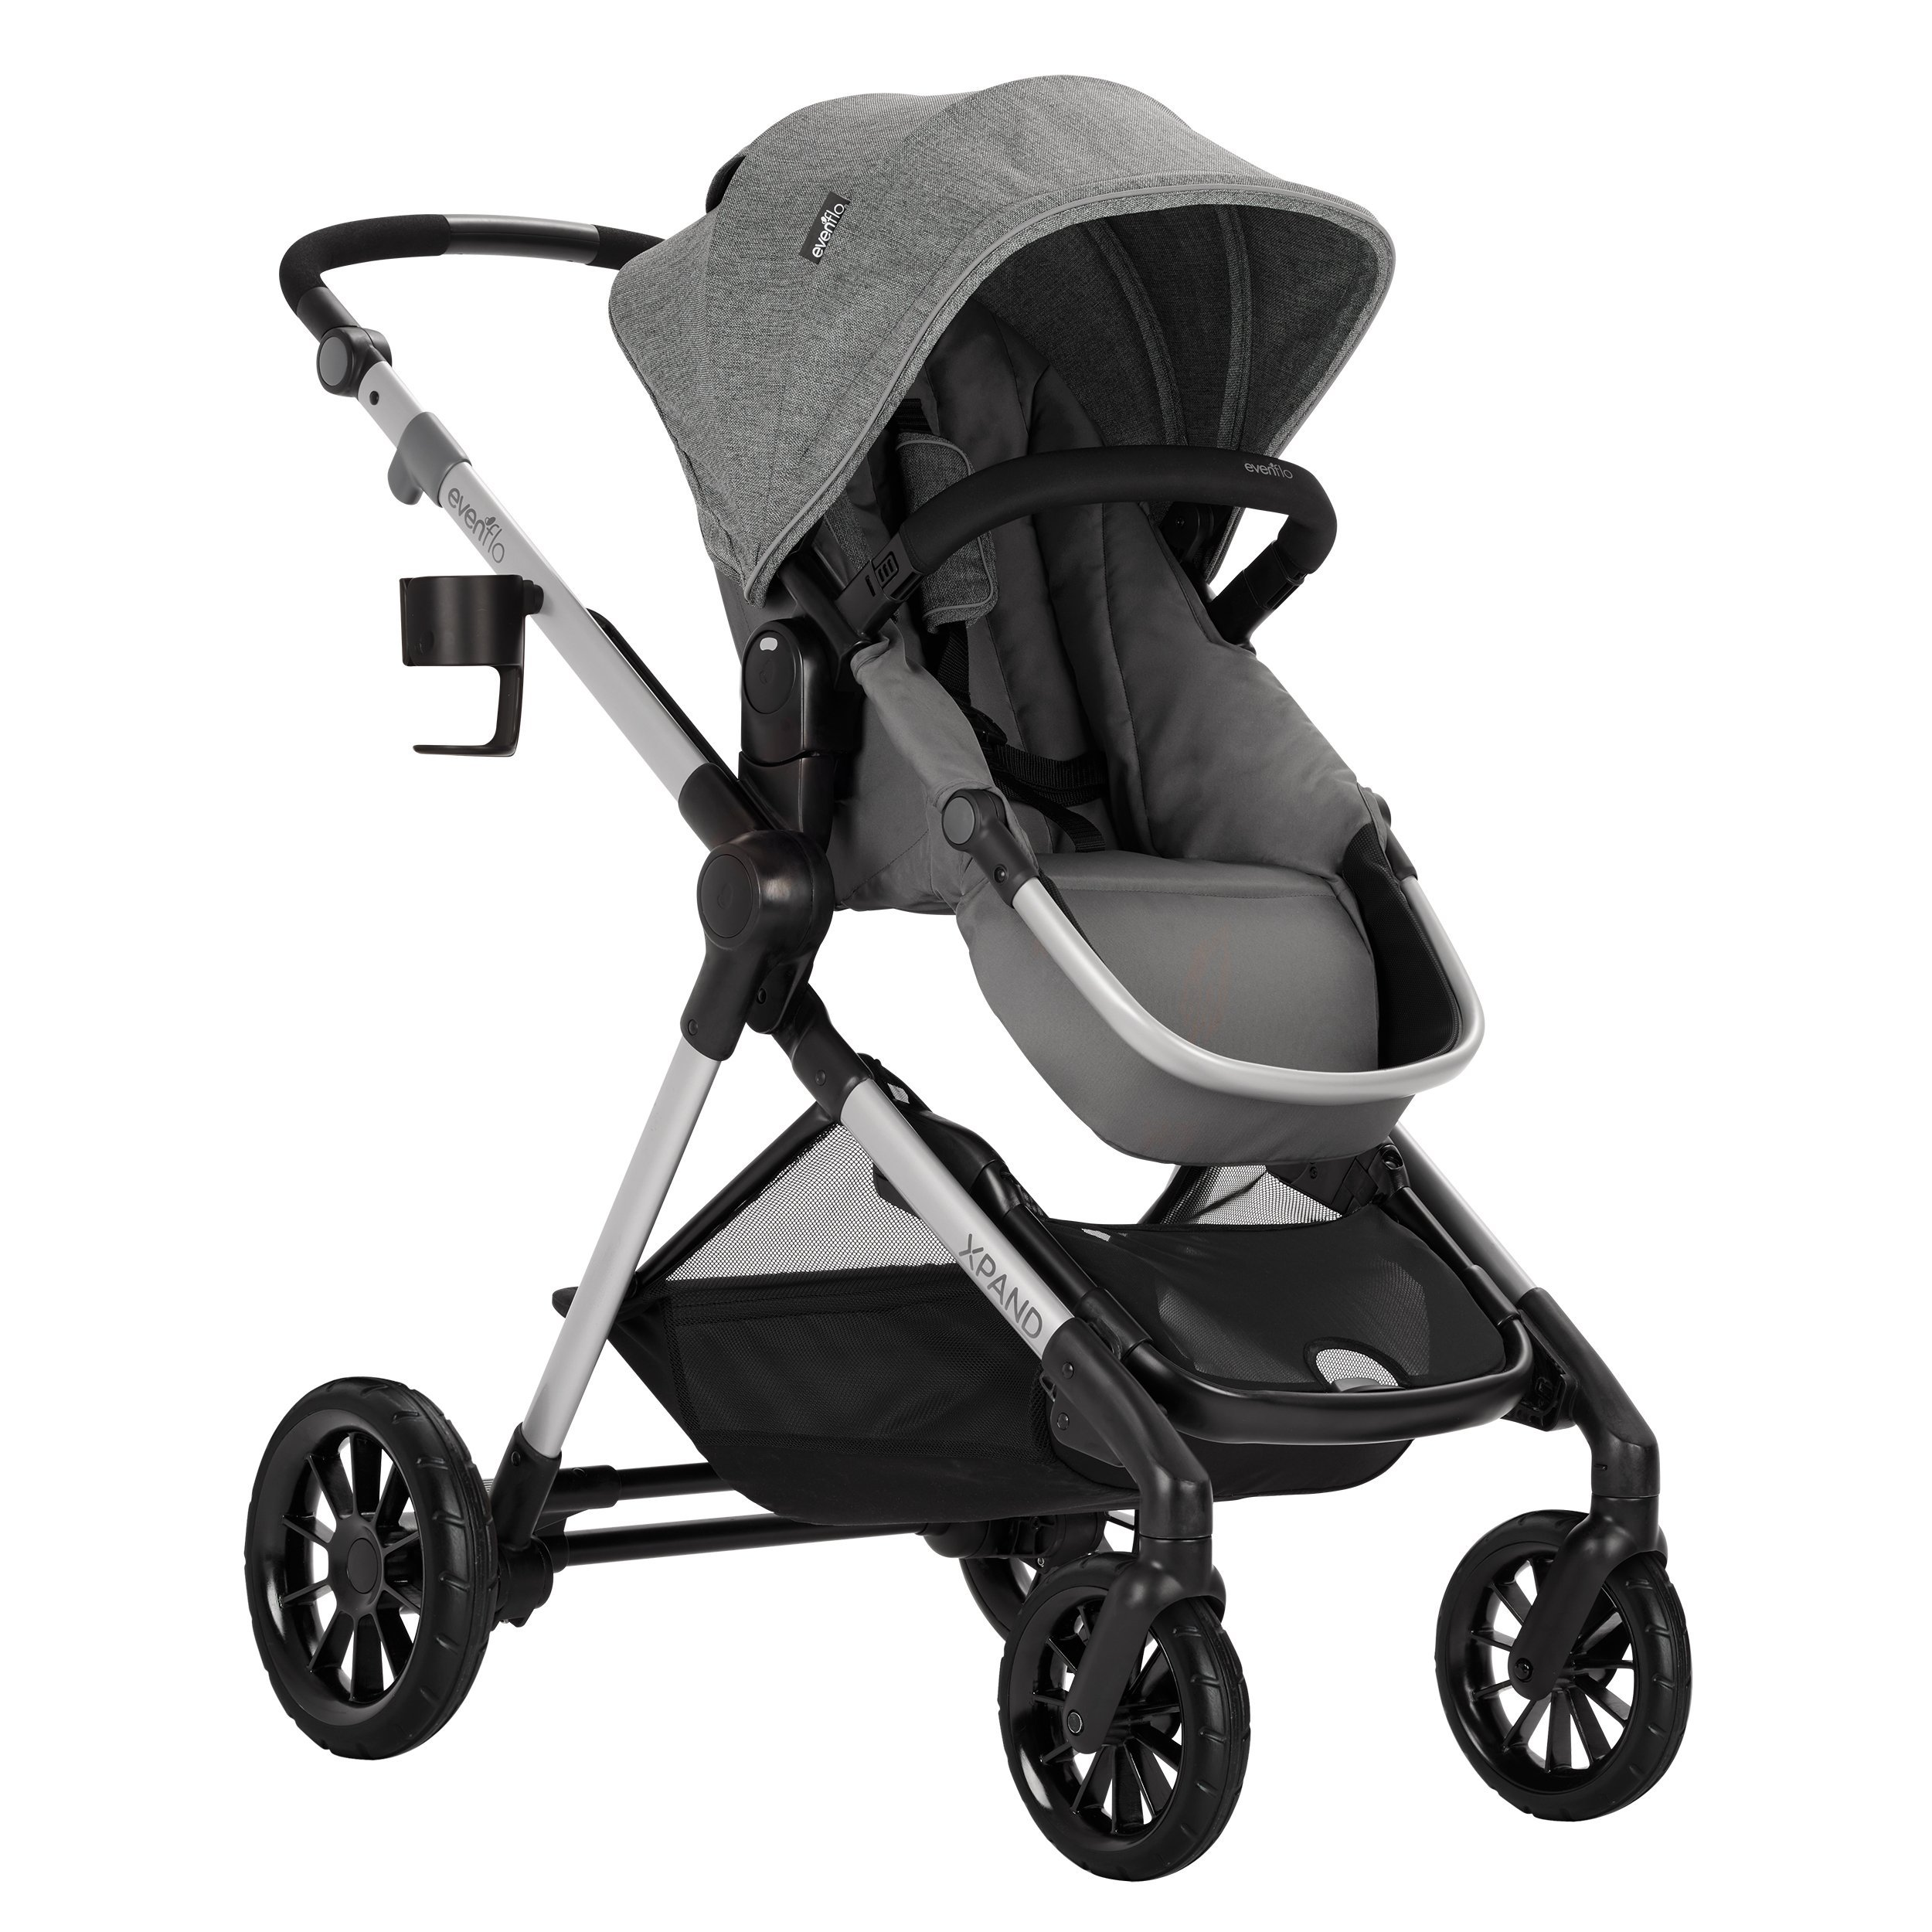 Evenflo Pivot Xpand Modular Stroller, Baby Stroller, Converts to Double Stroller, 4 Modes, Durable Construction, Extra-Large Storage Basket, Compact Folding Design, 55-lb Capacity, Percheron Gray